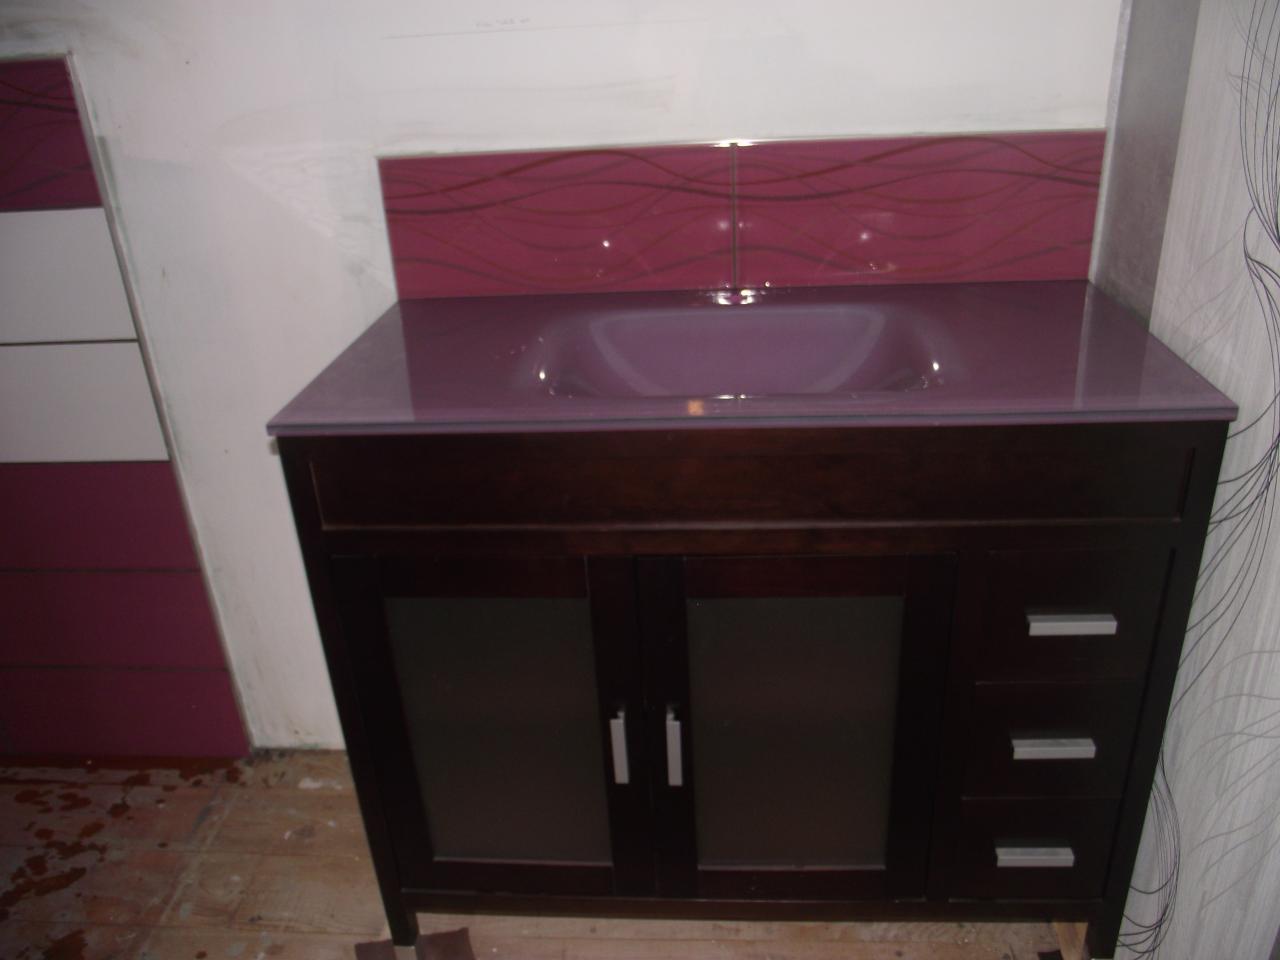 Carrelage pos au dessus lavabo sdb for Salle de bain kvik